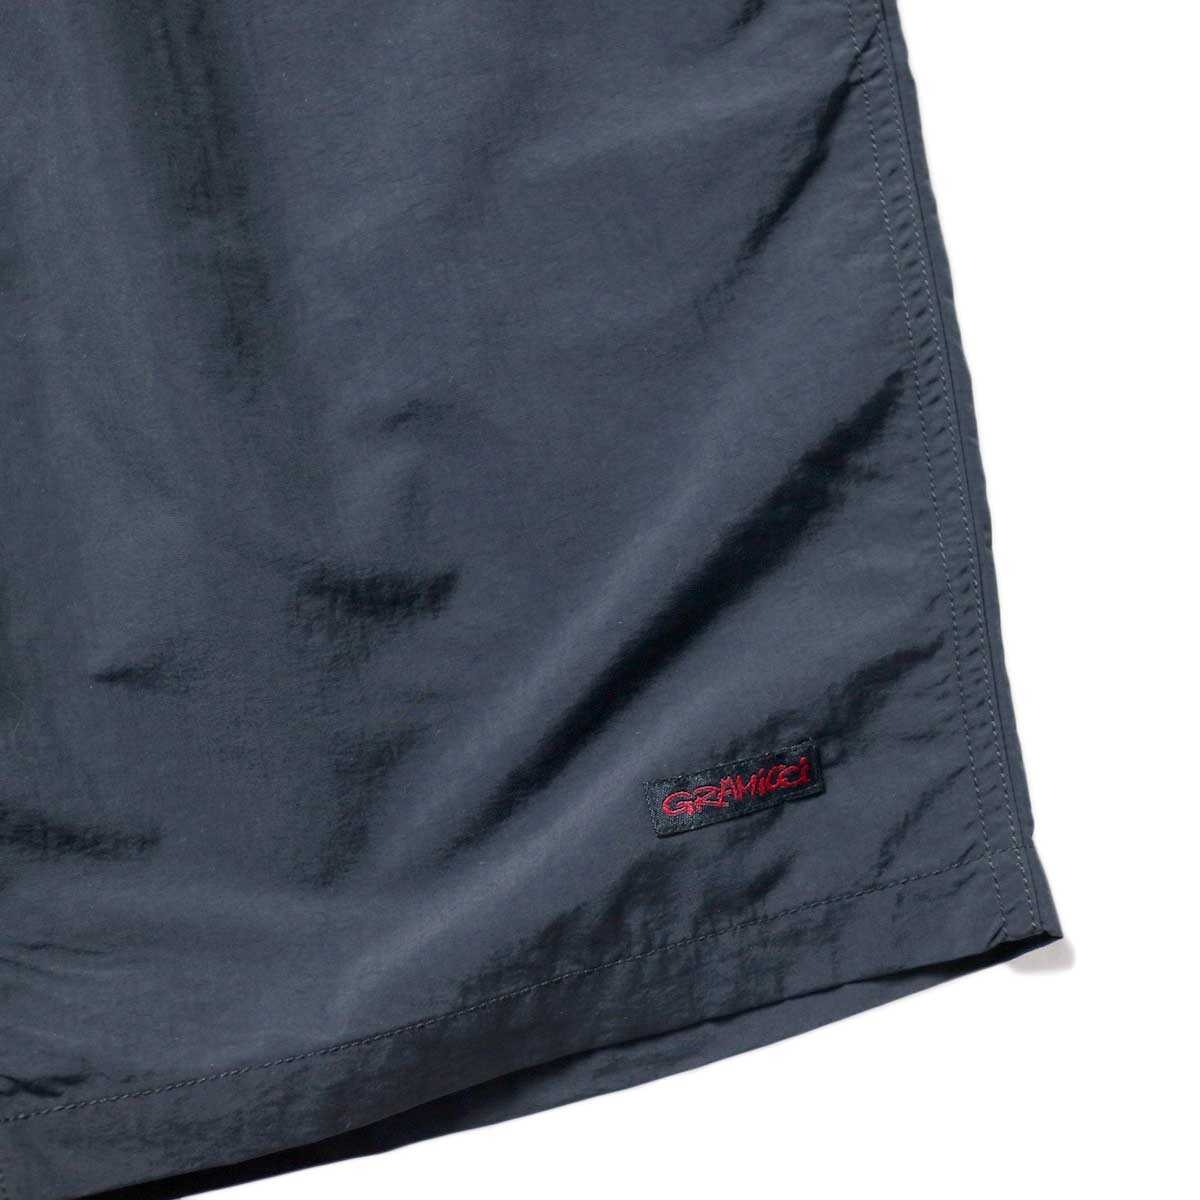 GRAMICCI / SHELL PACKABLE SHORTS (Black)左裾ビスネーム